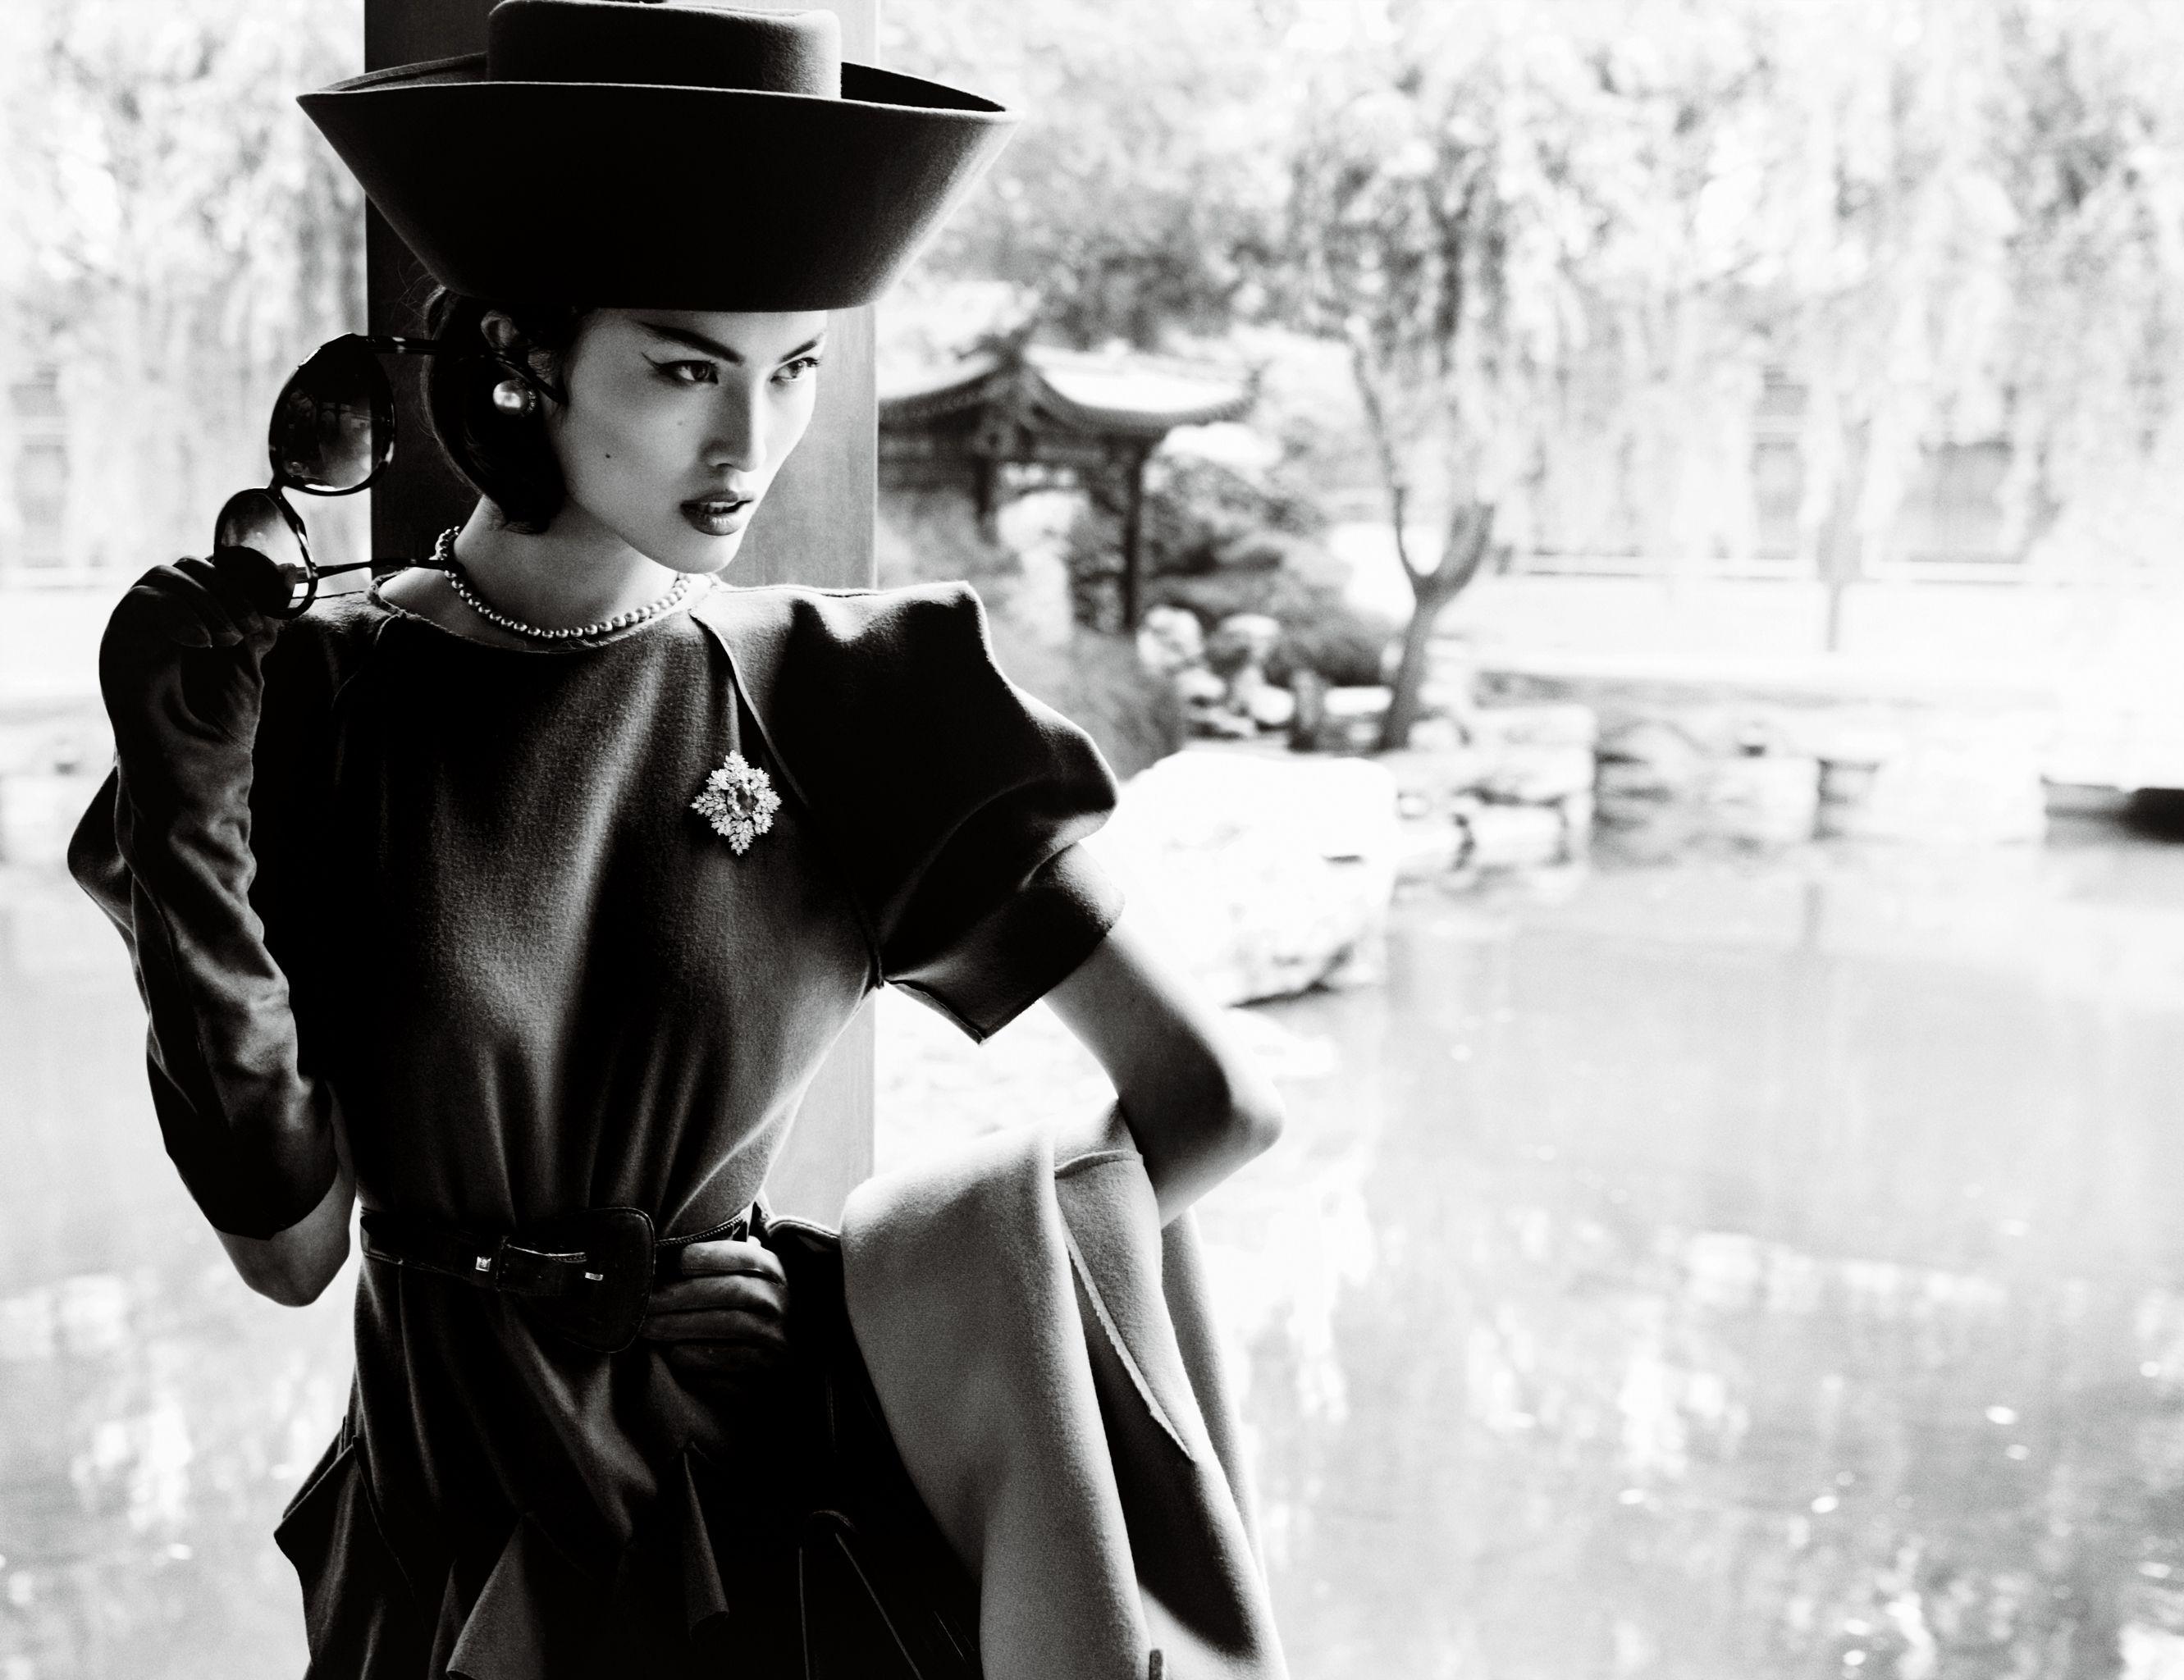 Картинки ретро девушки в шляпе